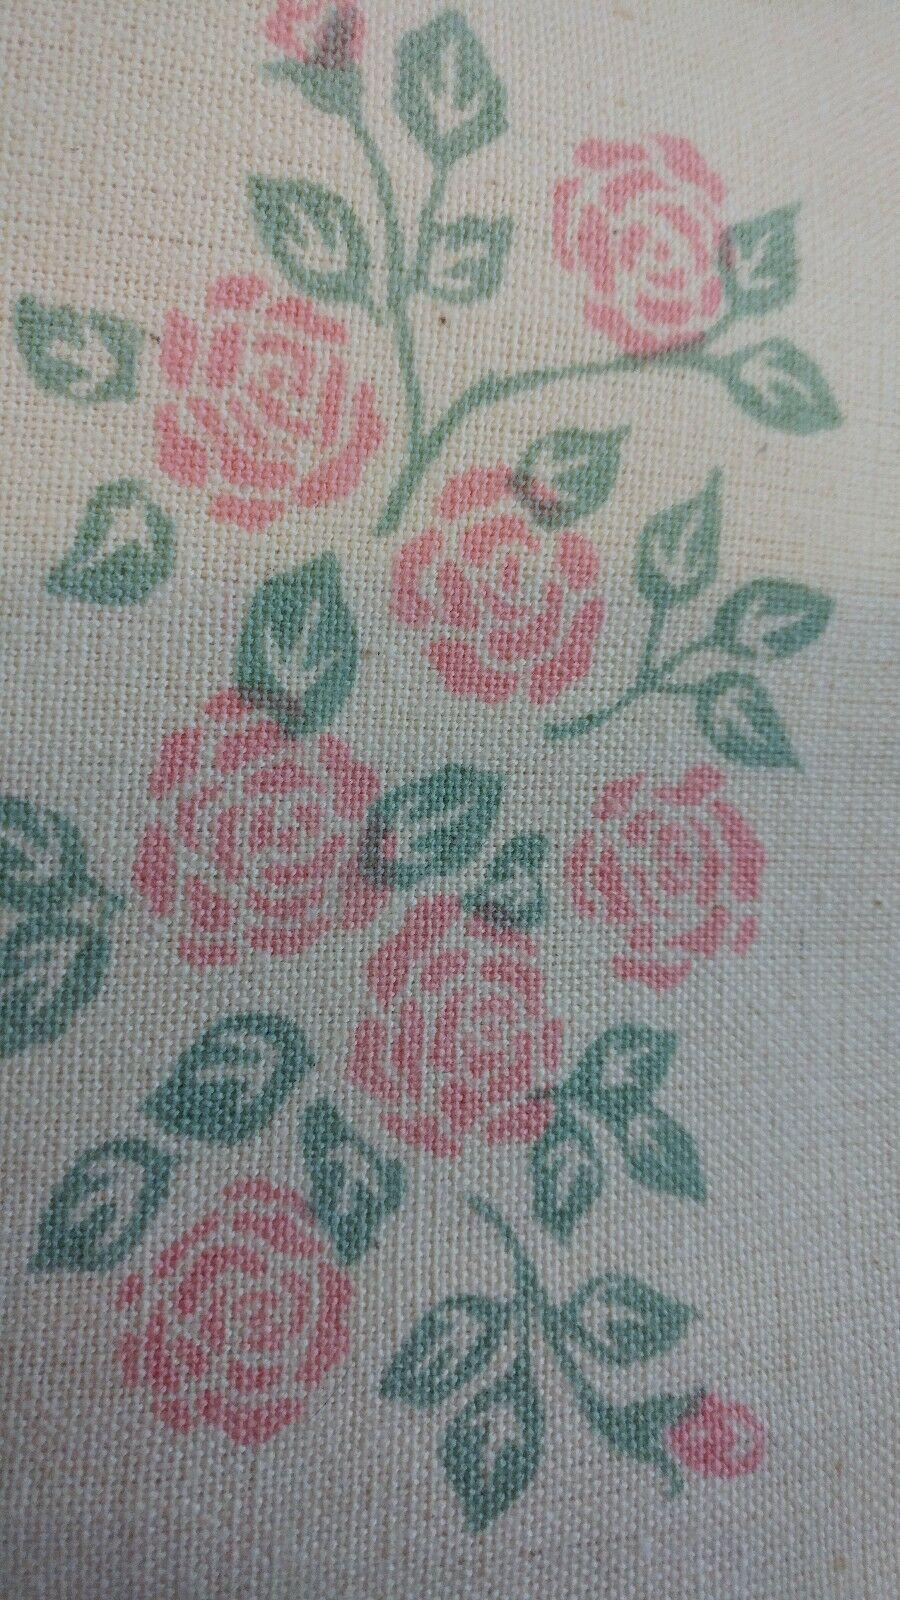 Vintage Dish Tea Towels Rose Floral on Beige Cream 100% Cotton  NWT Lot of 6